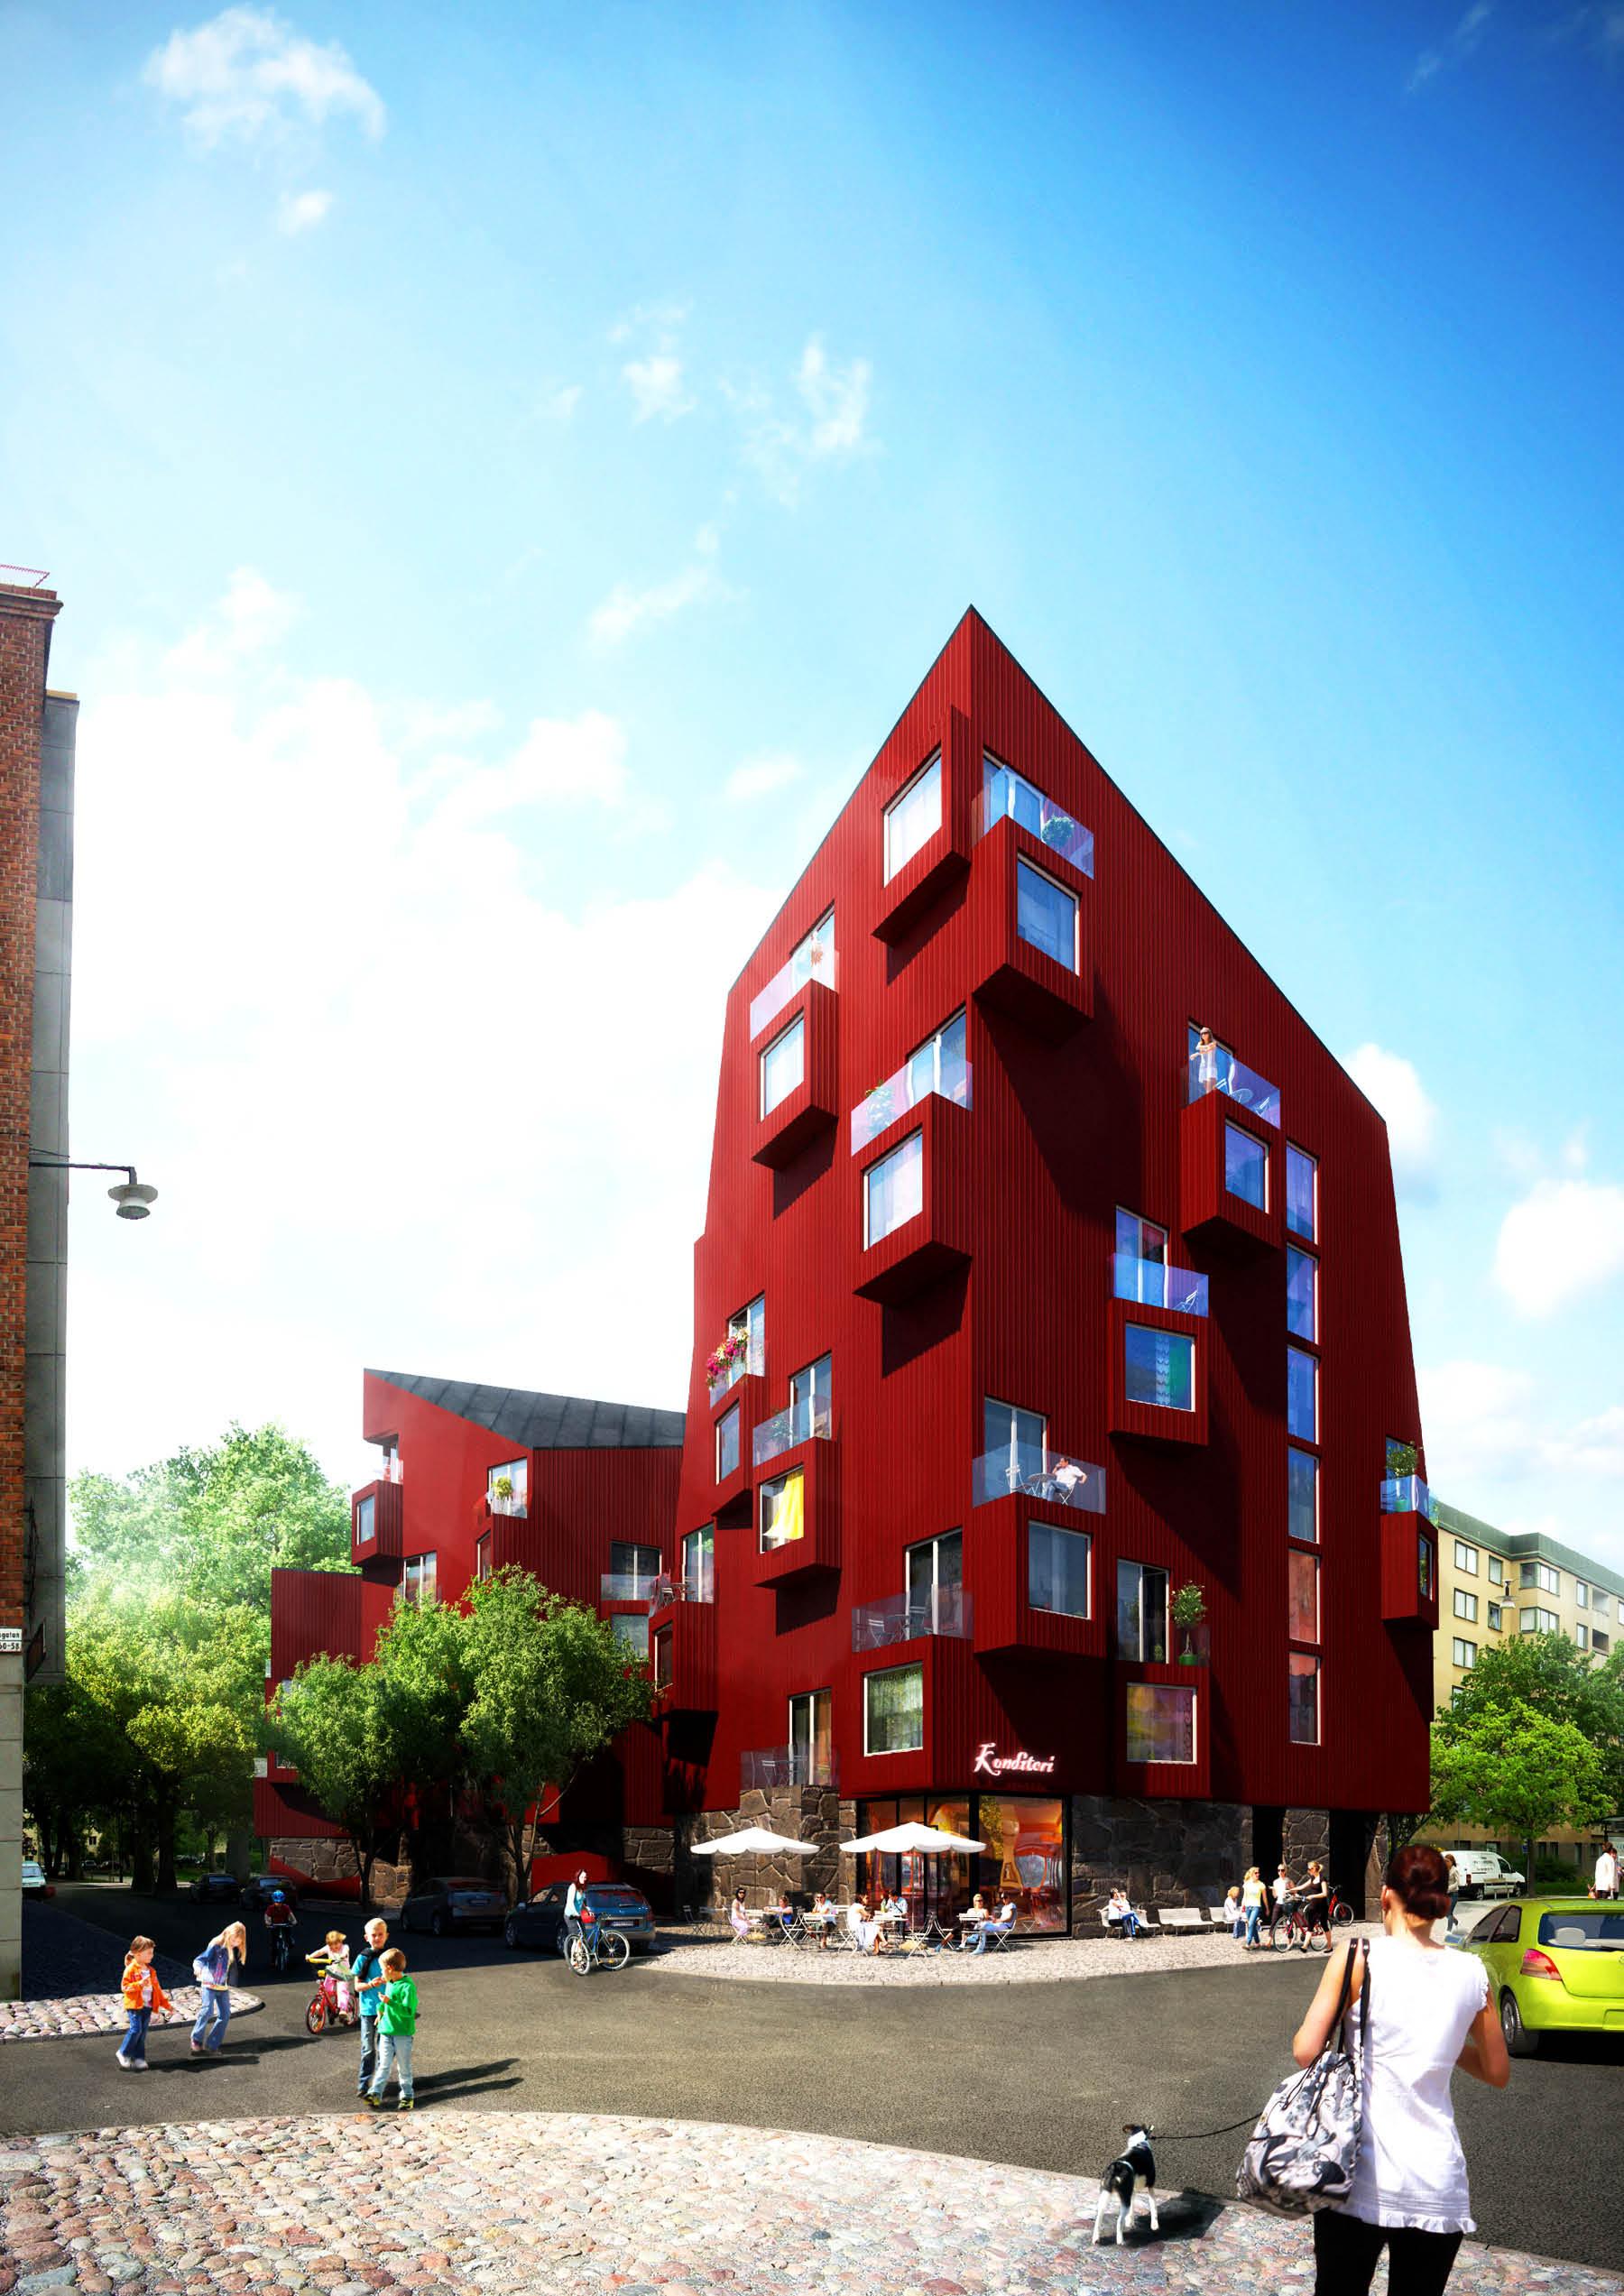 Architecture Of A Mom 15 Easy Diy Gift Ideas: Utopia Arkitekter Reinterprets Stockholm's Vernacular